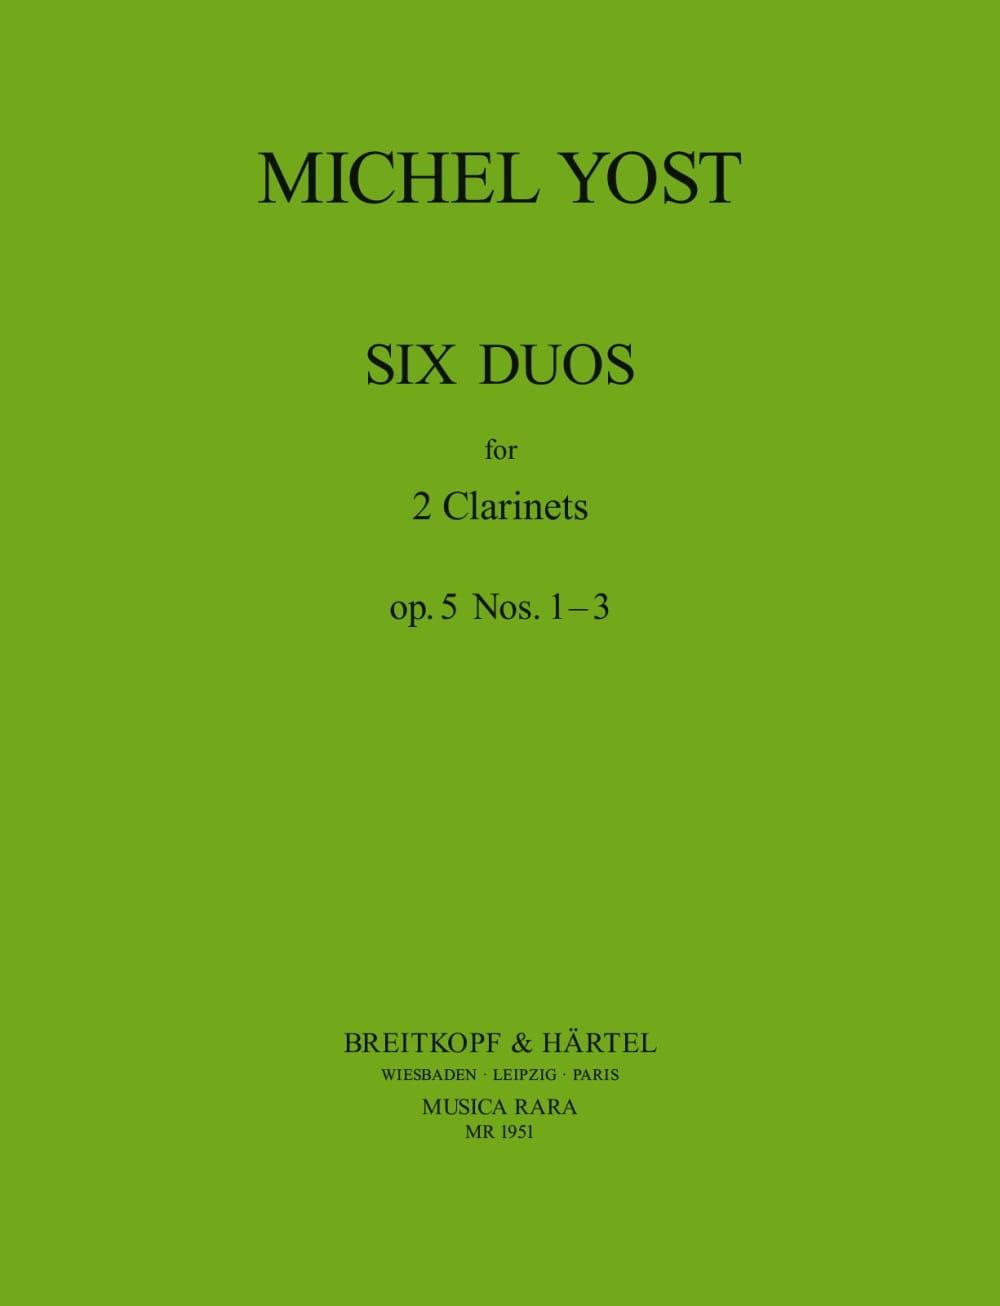 6 Duos Op. 5 N° 1-3 2 Clarinettes - Michel Yost - laflutedepan.com